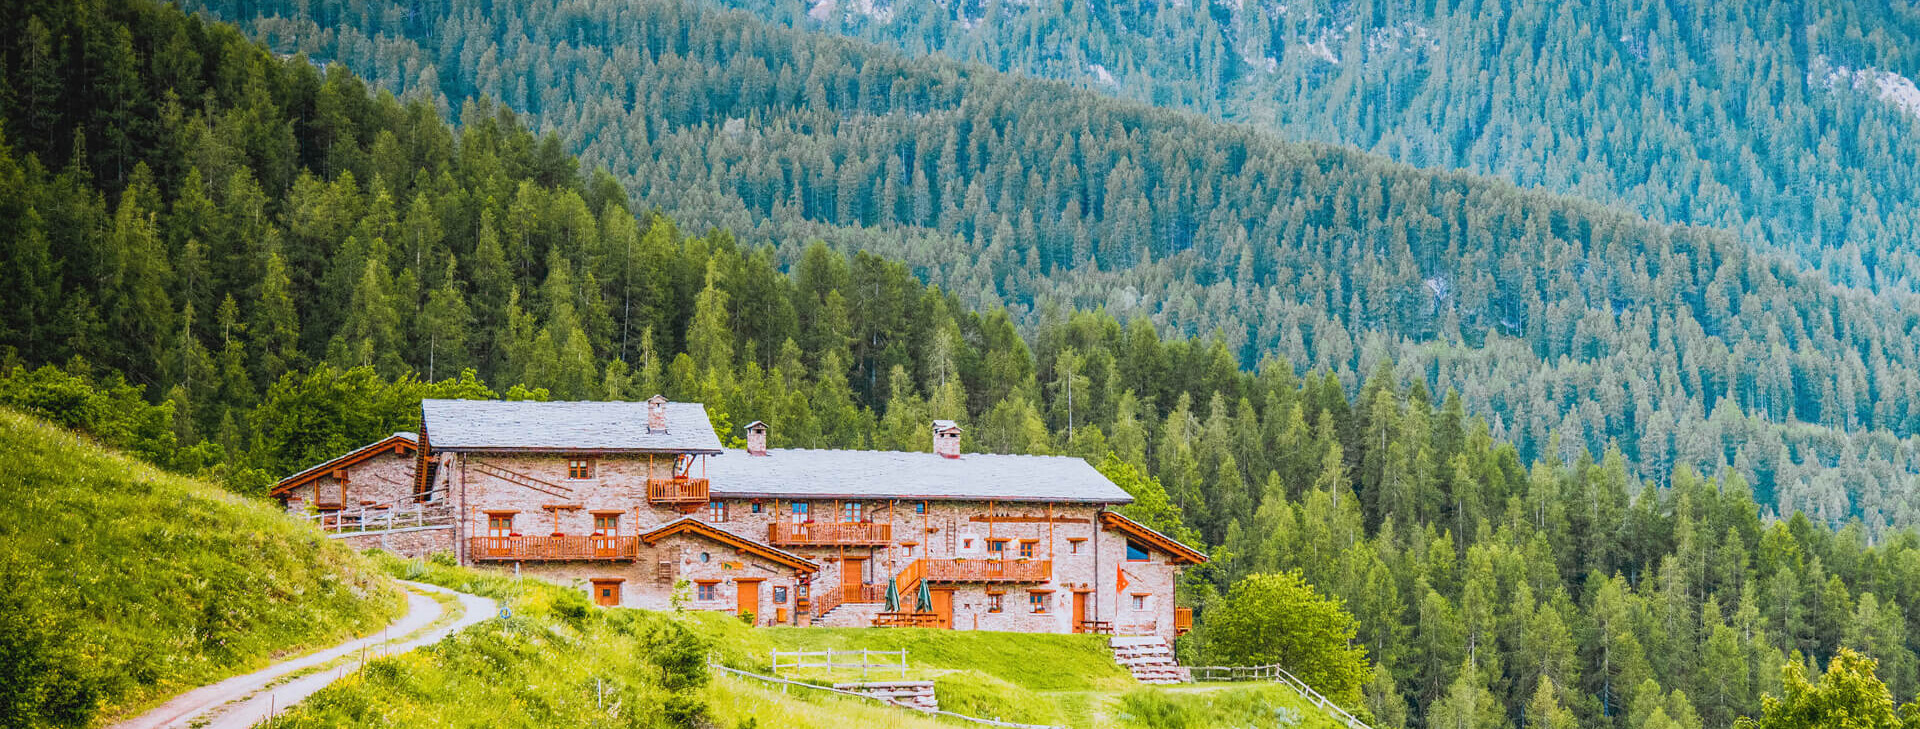 Supertrips - Kleinschalig hotel in Italië